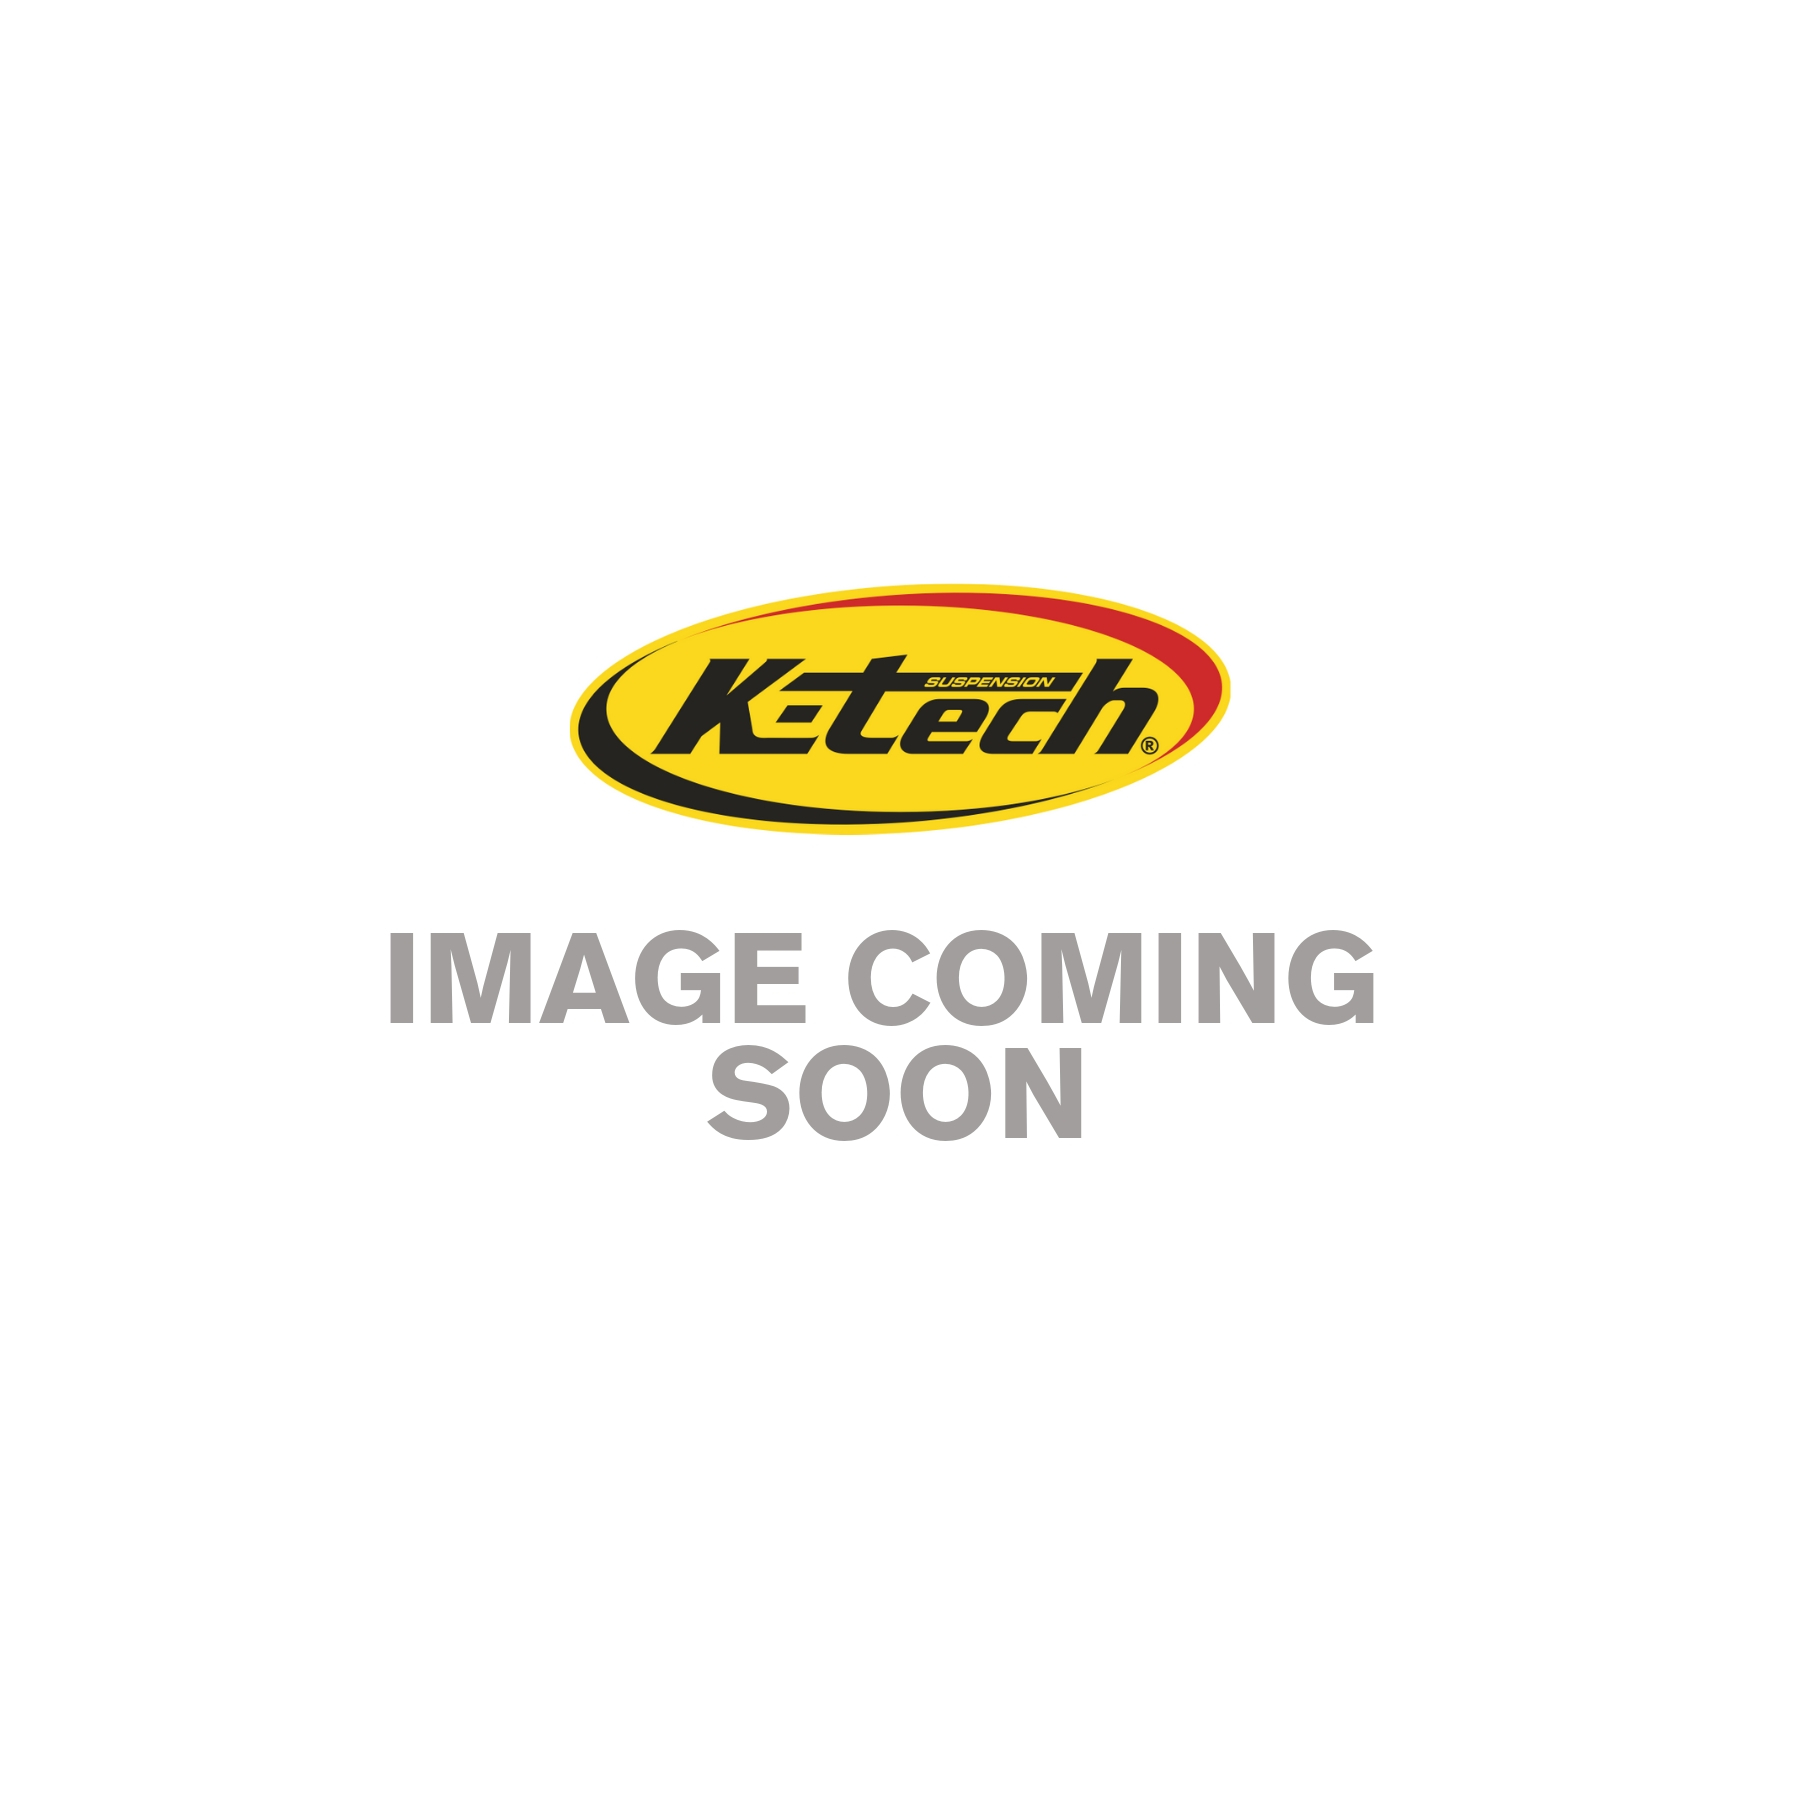 ORDS Front Fork Cartridges KTM 65SX 2012>, HVA TC65 2017> WP